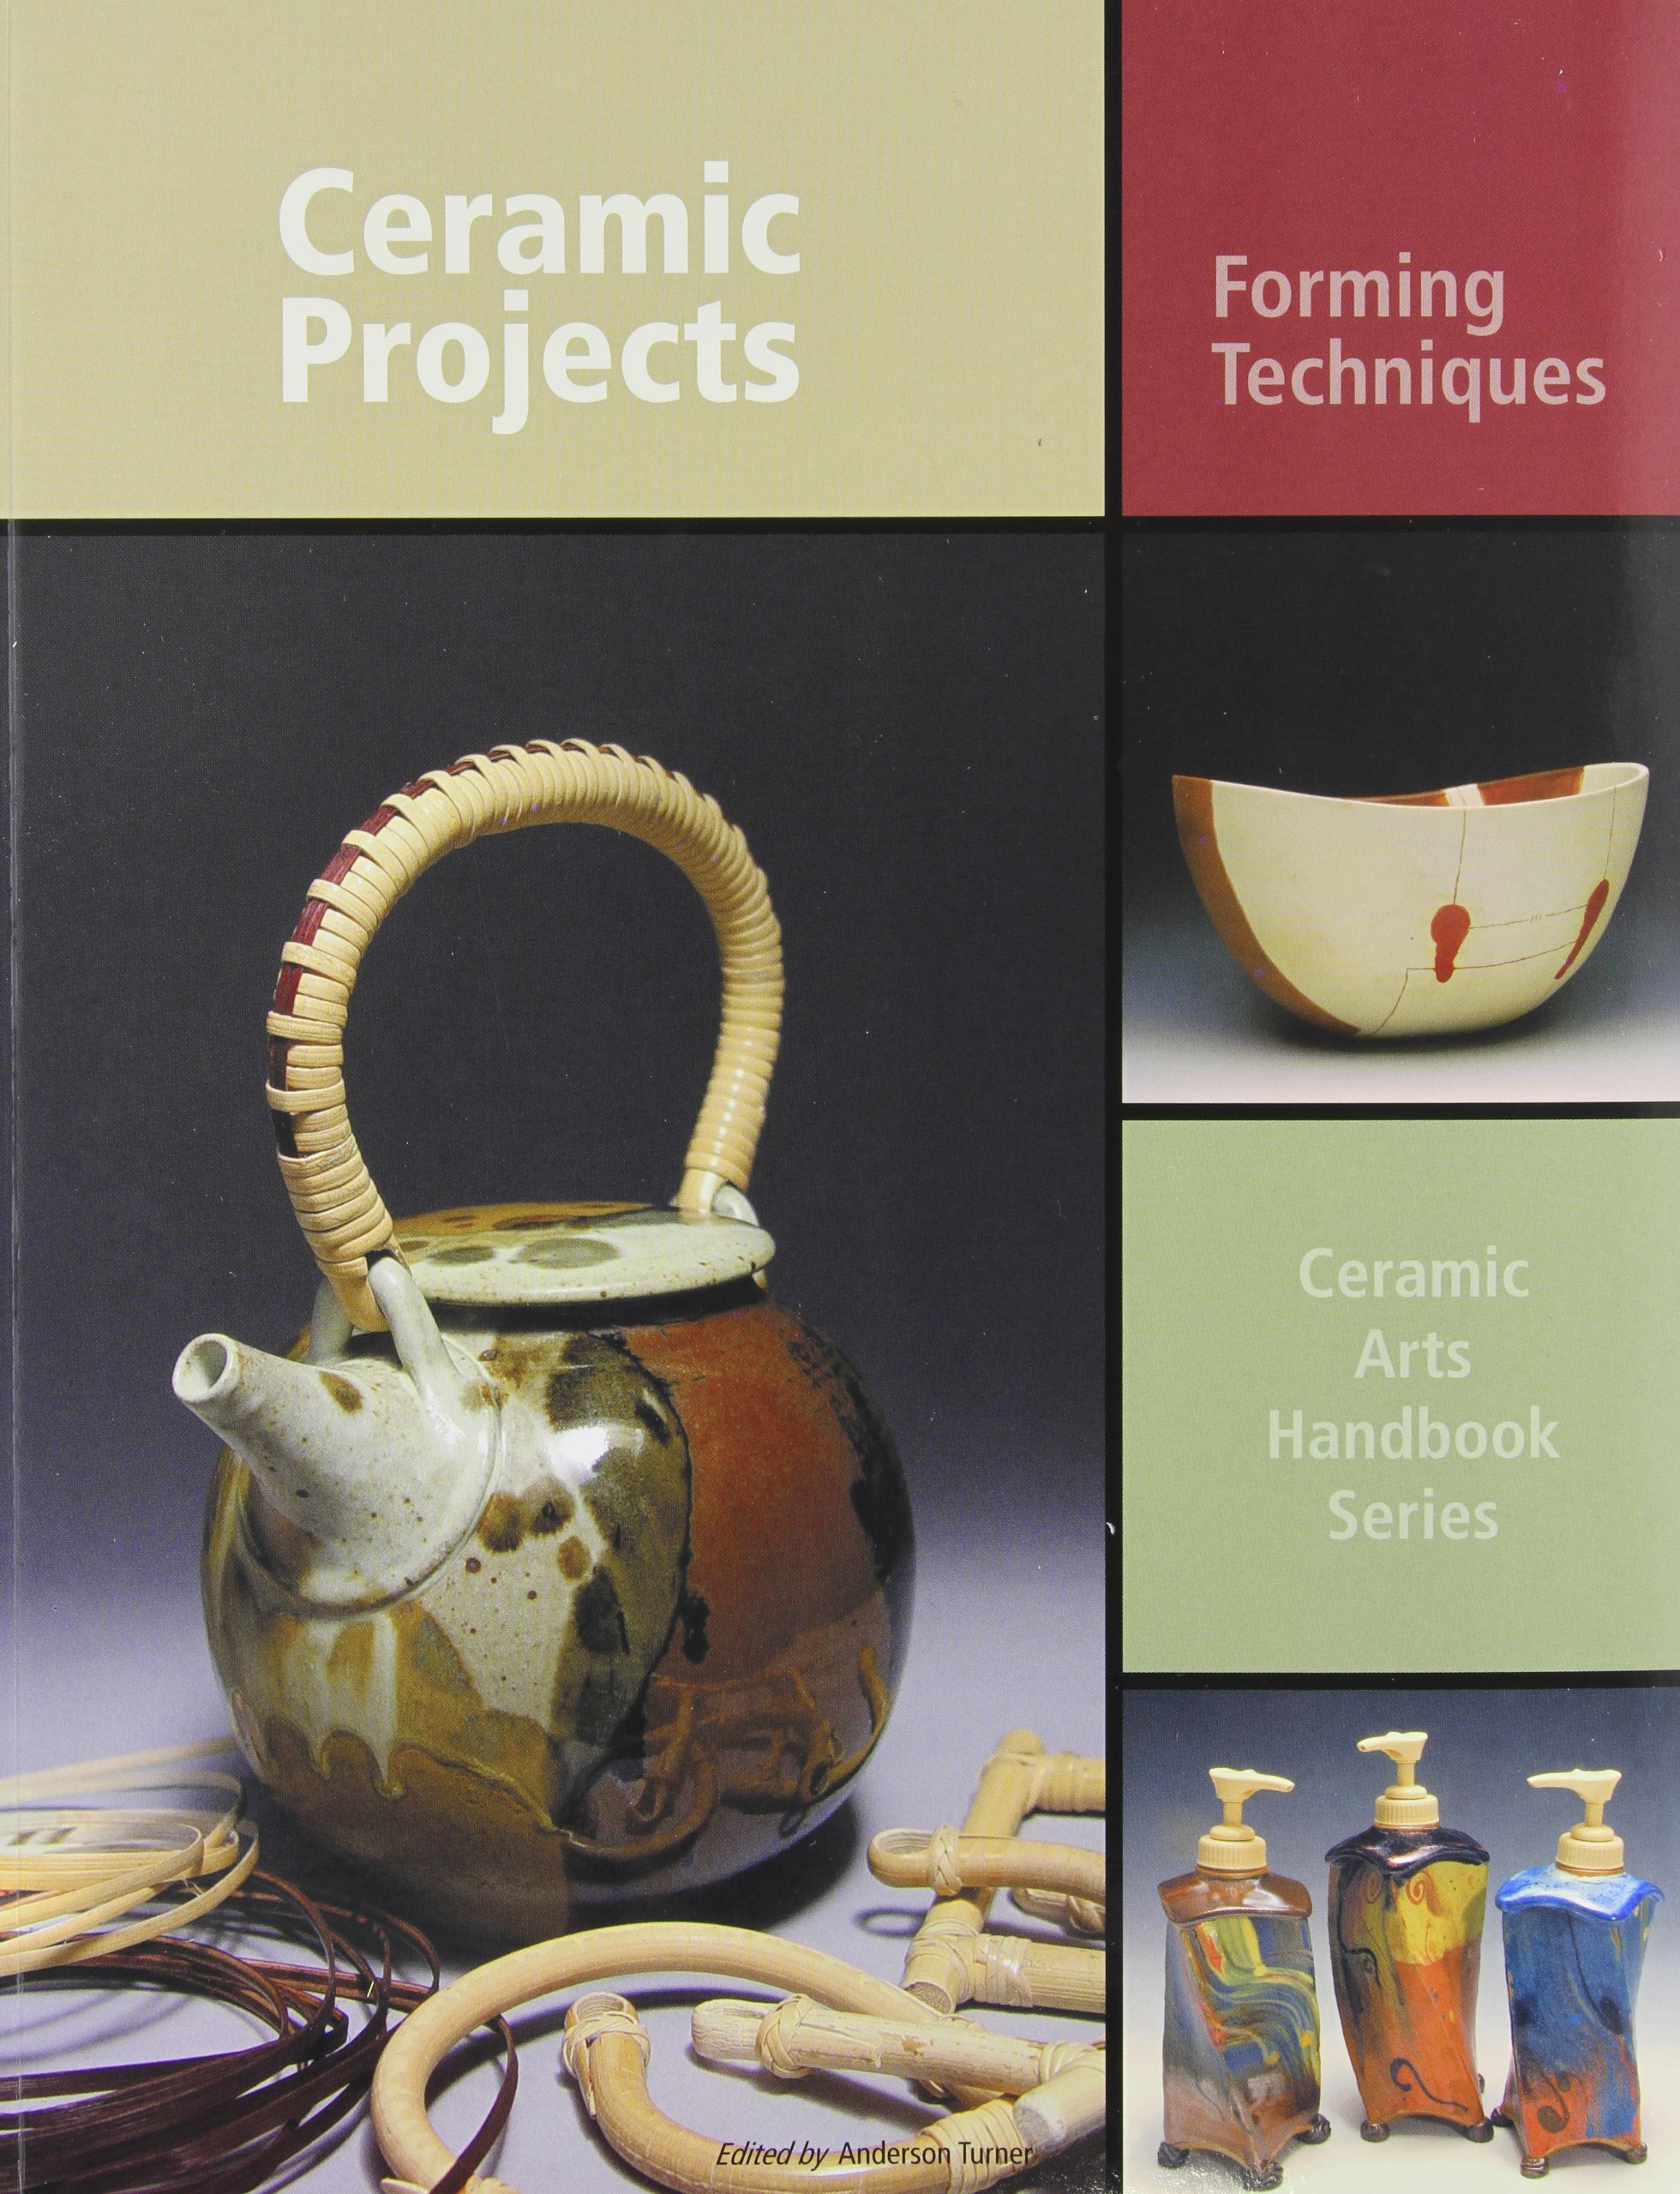 Ceramic Projects: Forming Techniques (Ceramic Arts Handbook Series) pdf